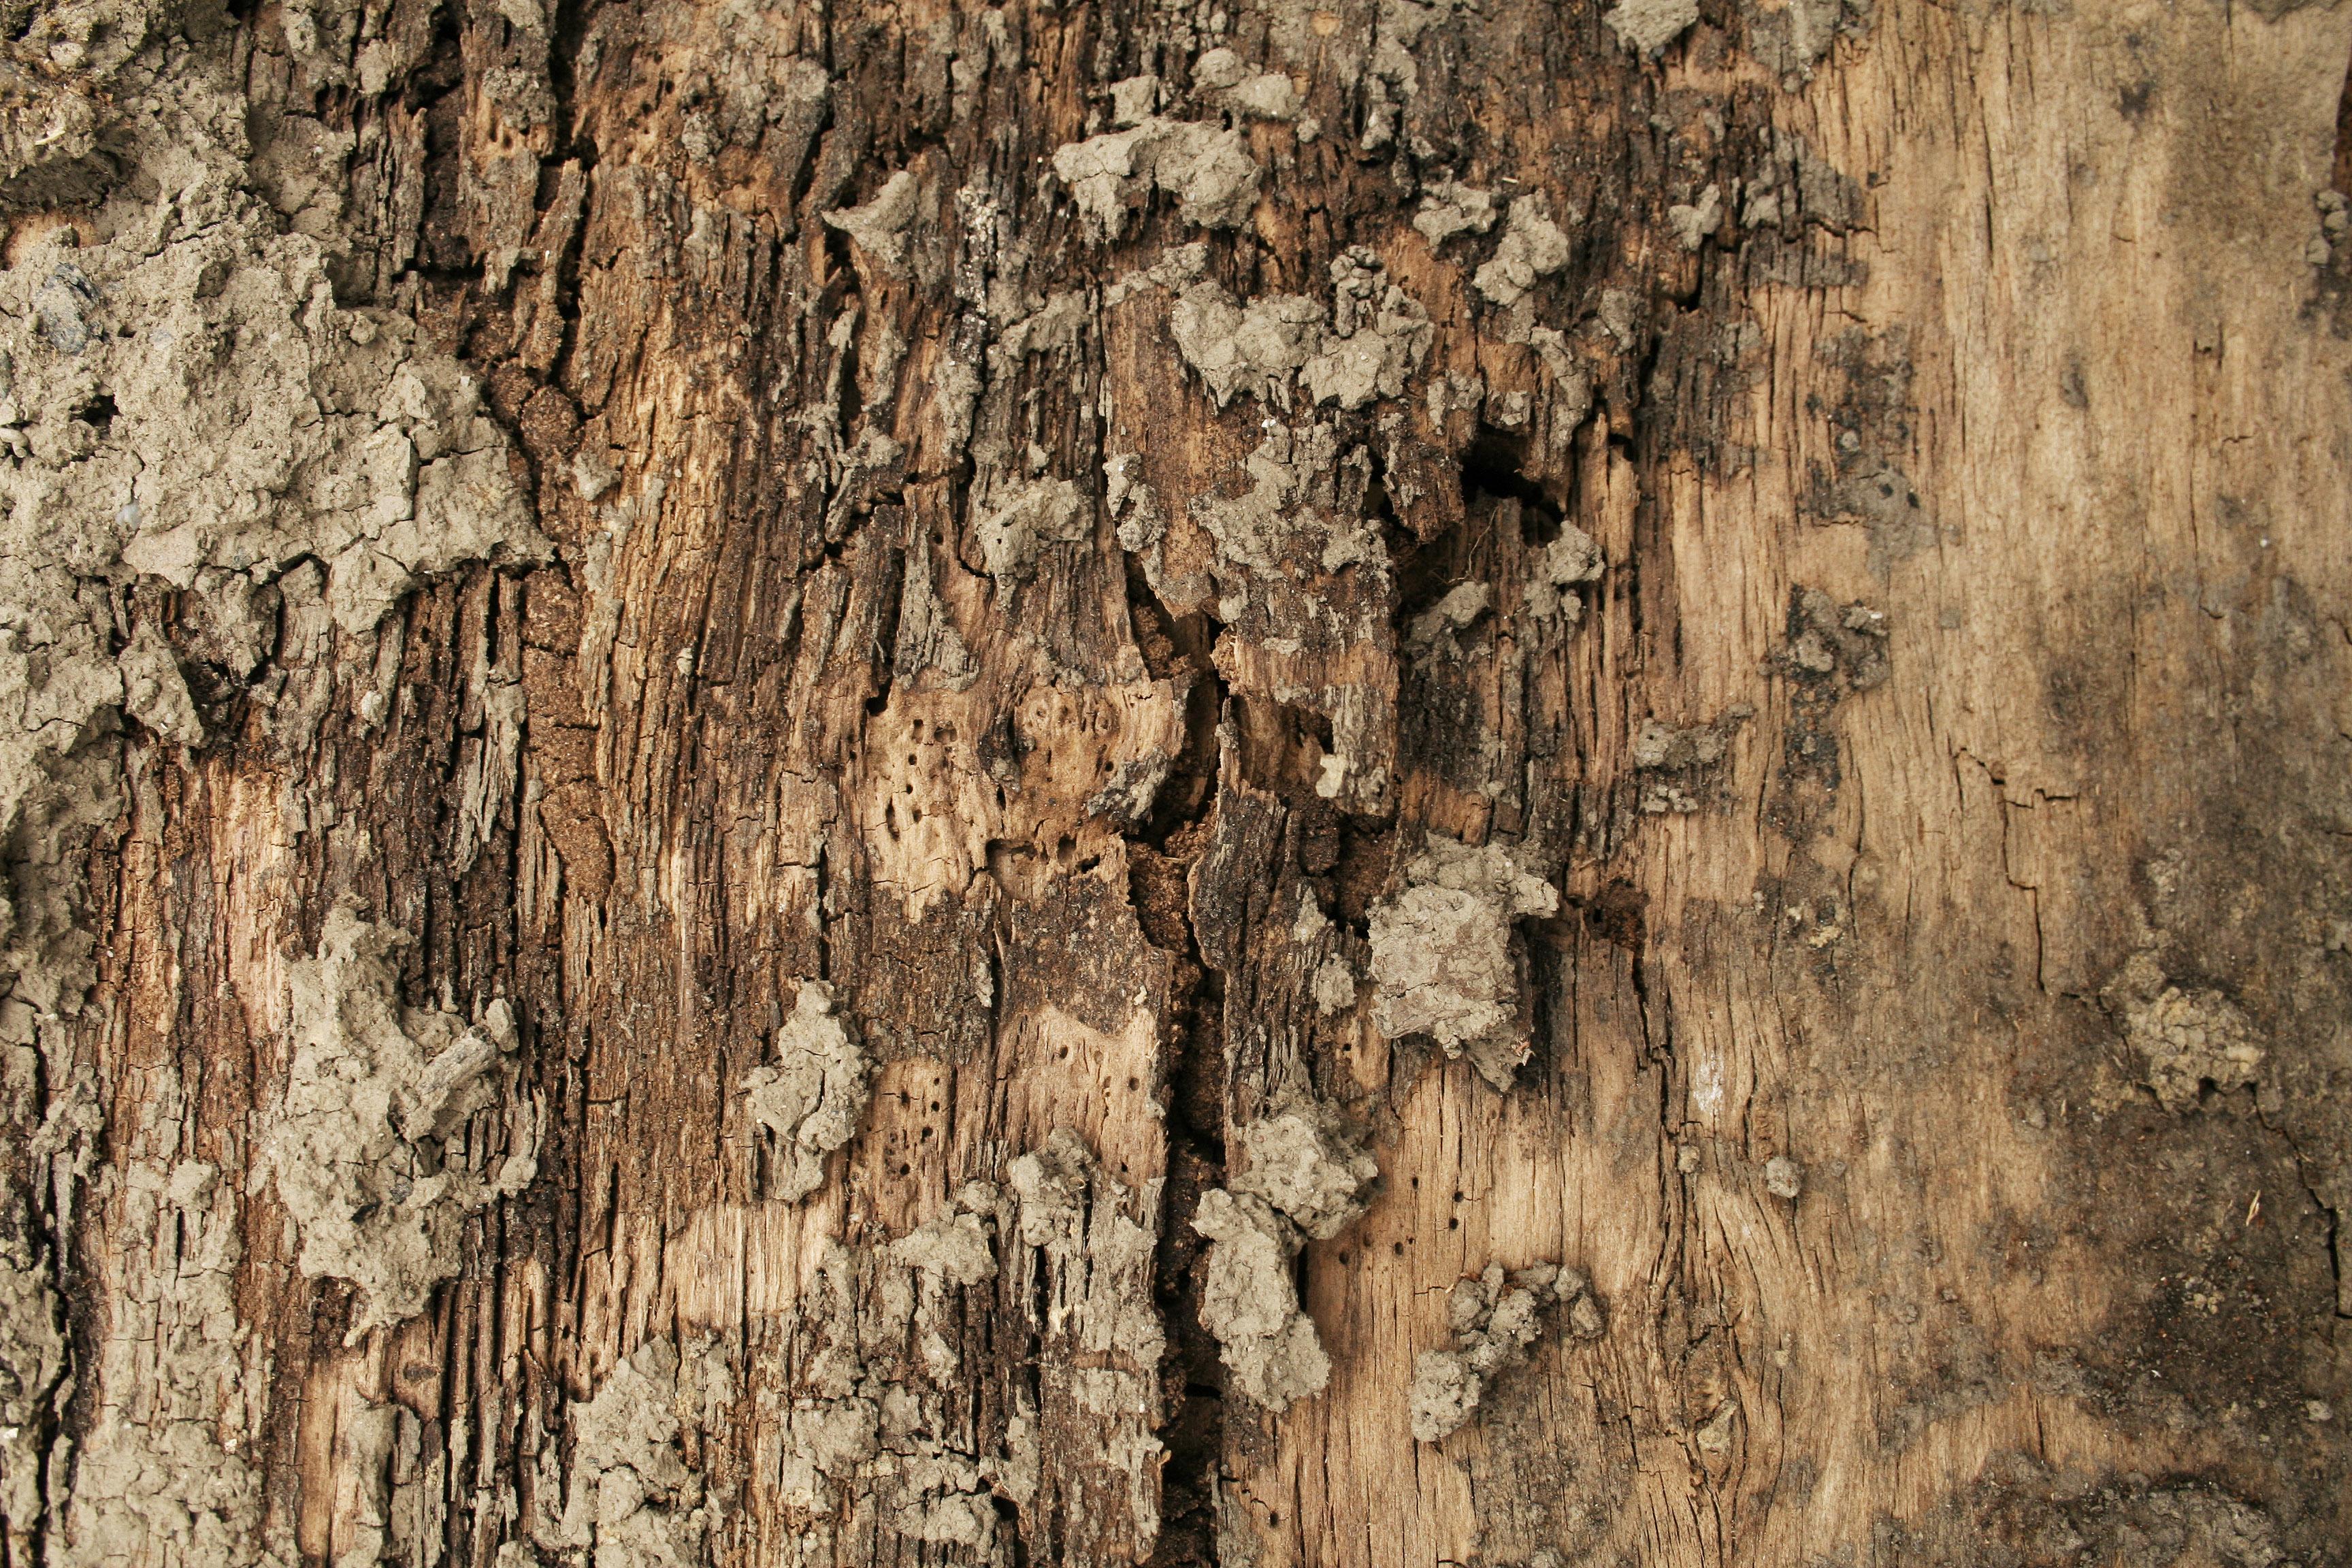 Download – wood brown tree bark texture